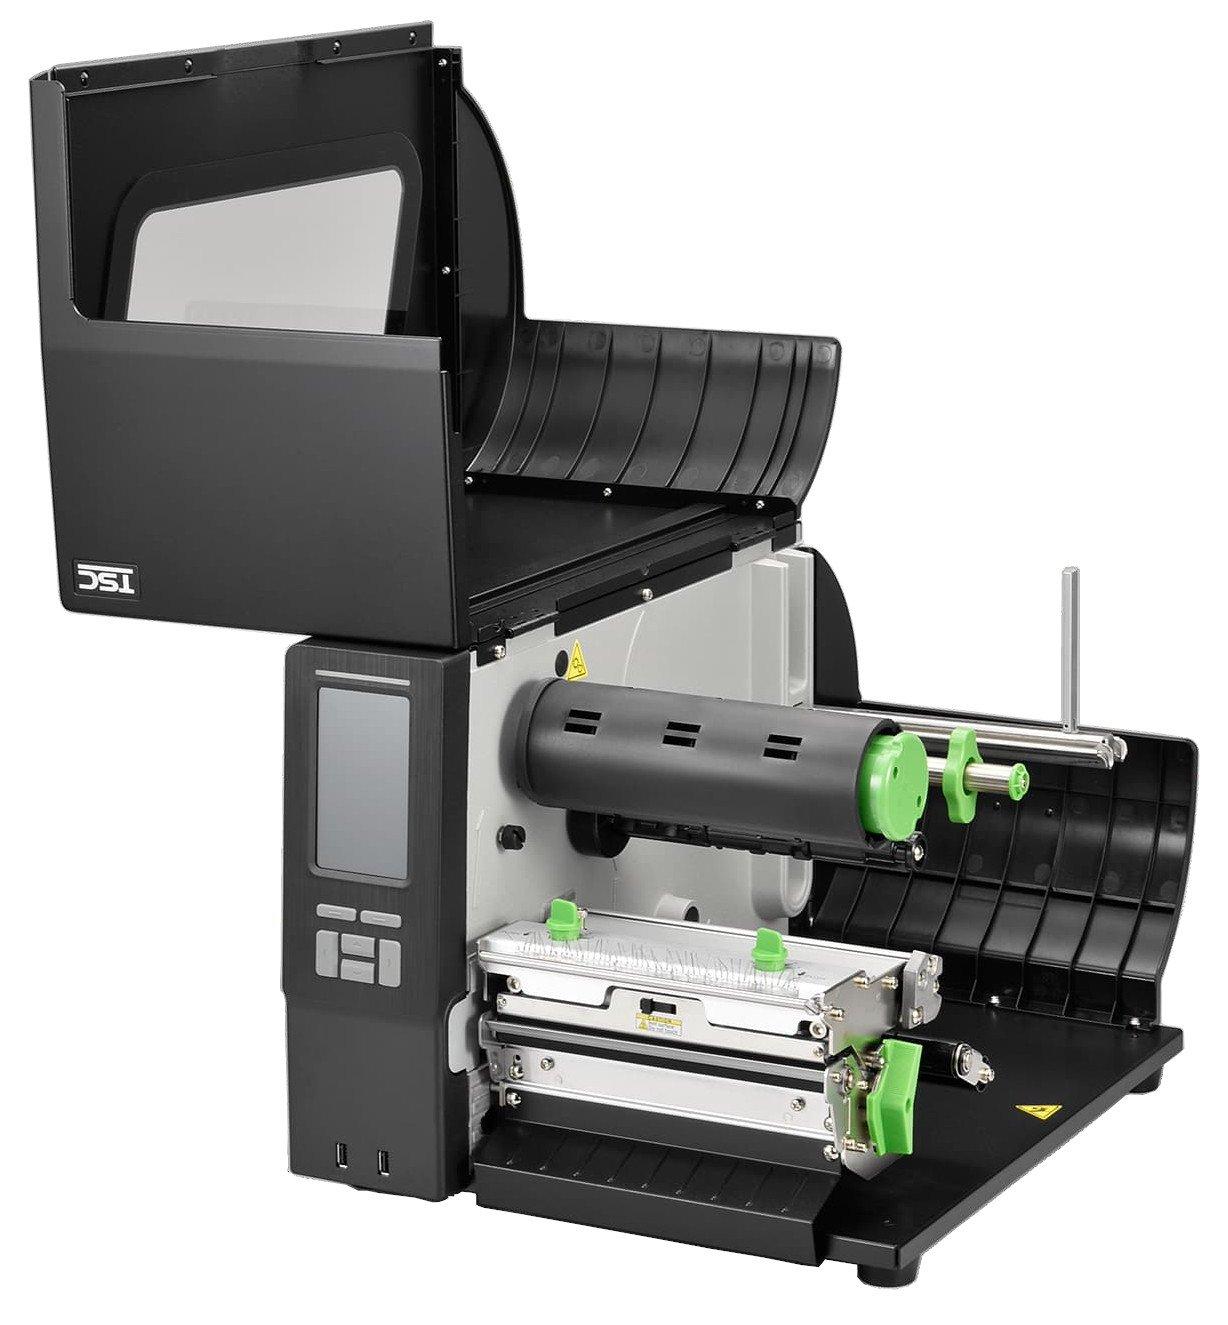 TSC MH261t Industriedrucker